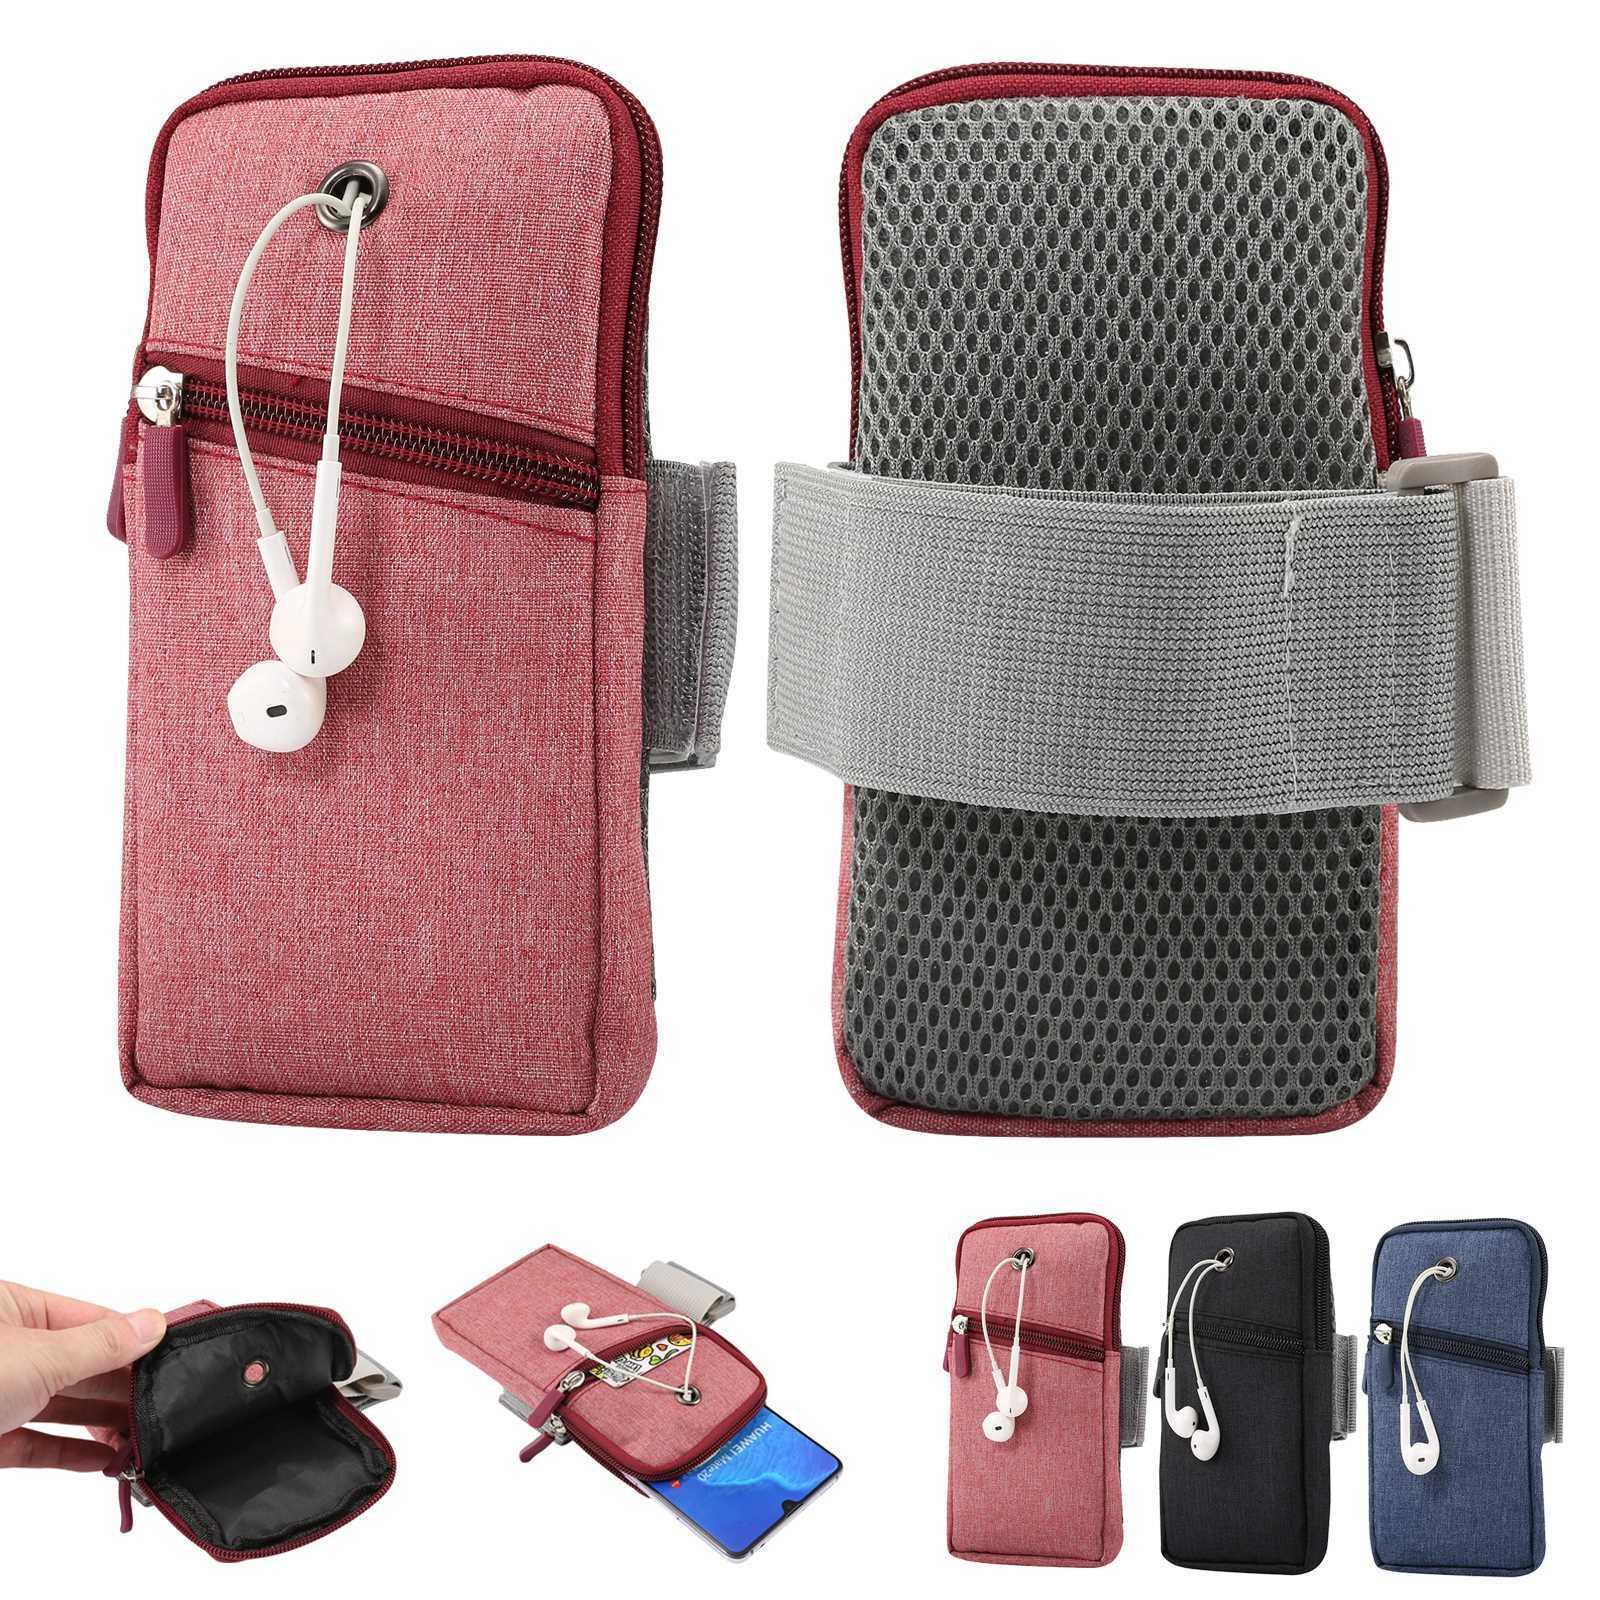 Sport Elastic Strap Arm Jog Wallet Zip Case Fr iPhone/Samsun